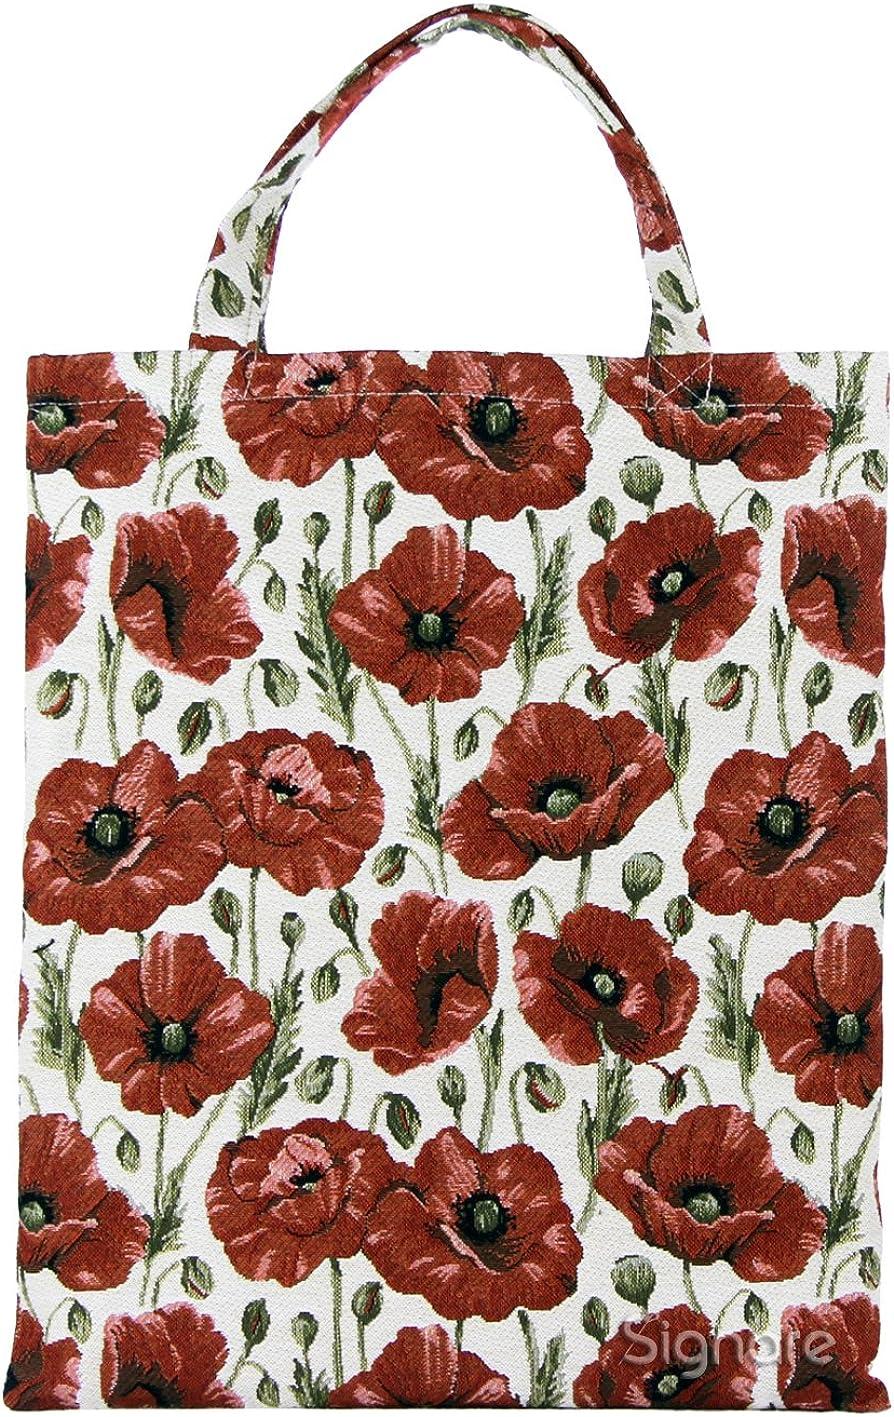 Signare Bolsa para compras reutilizable mujer en tela de tapiz bolsa eco